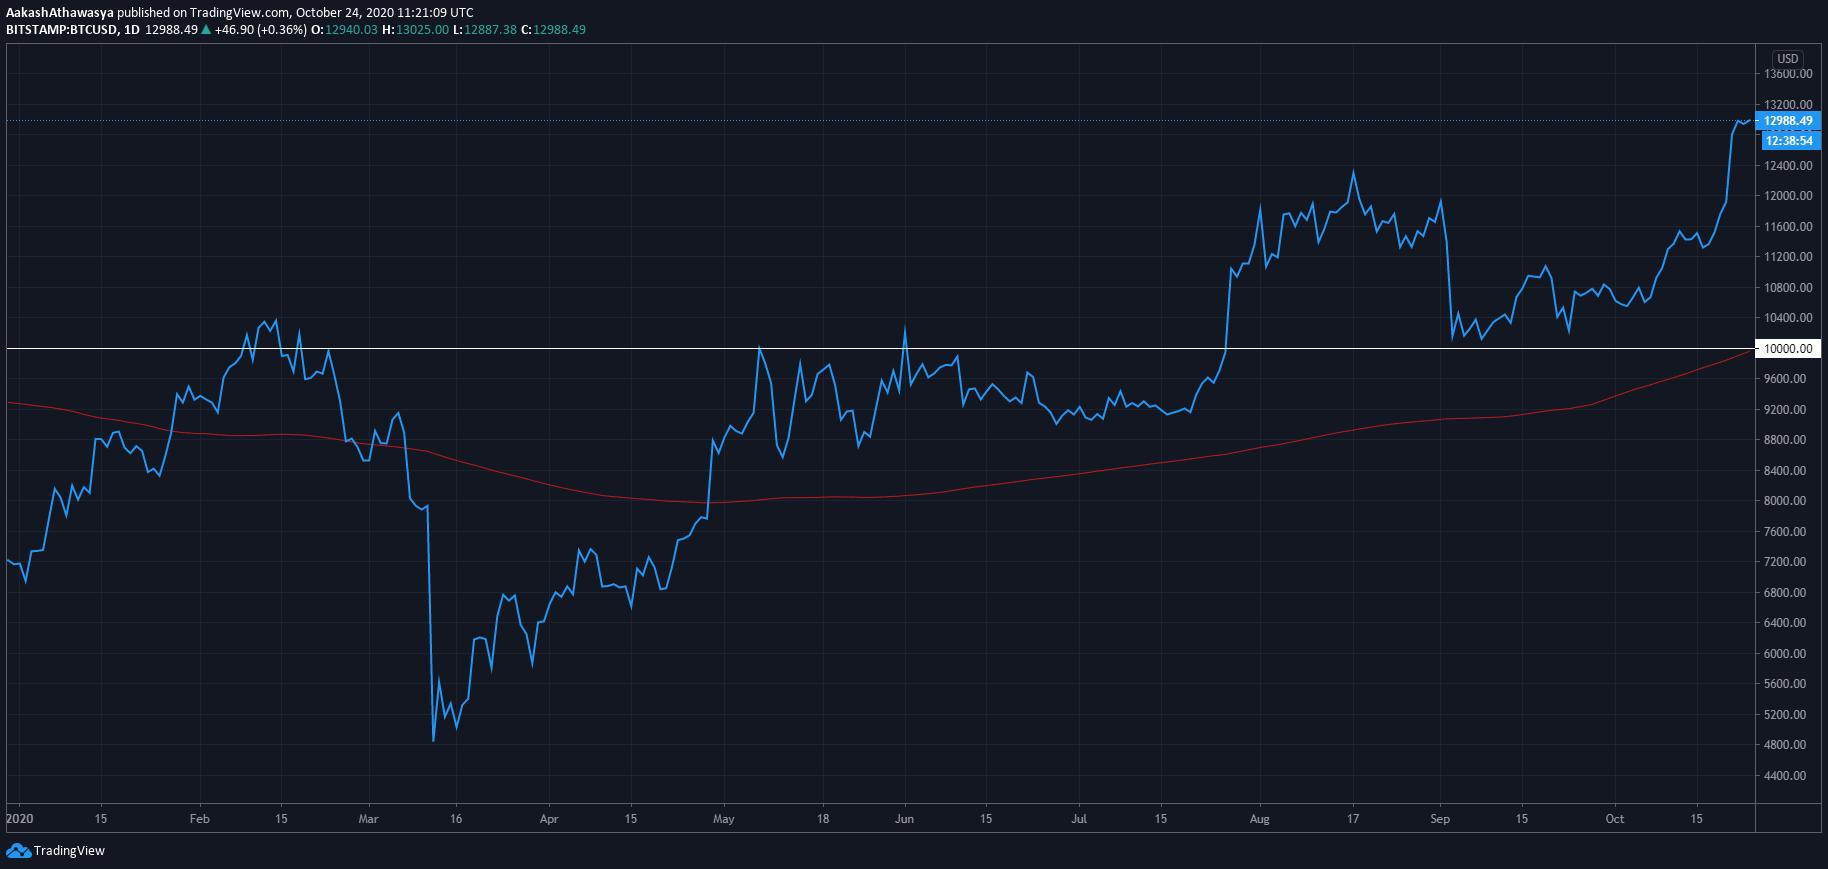 ¿Con qué frecuencia debería comprar Bitcoin?